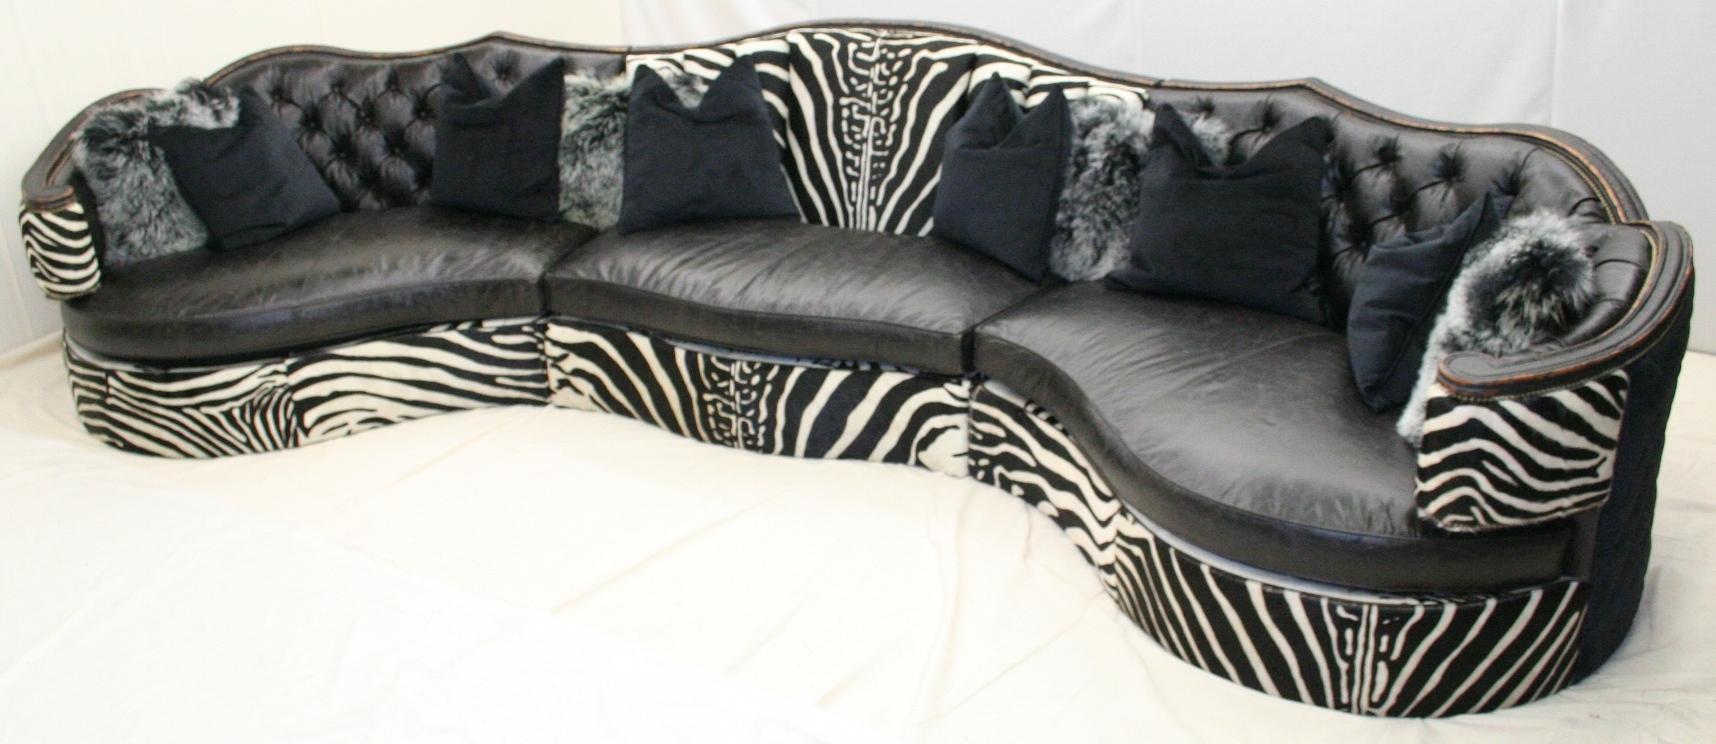 Zebra Sofa Print Fabric Bed Futon Thesofa Animal Covers